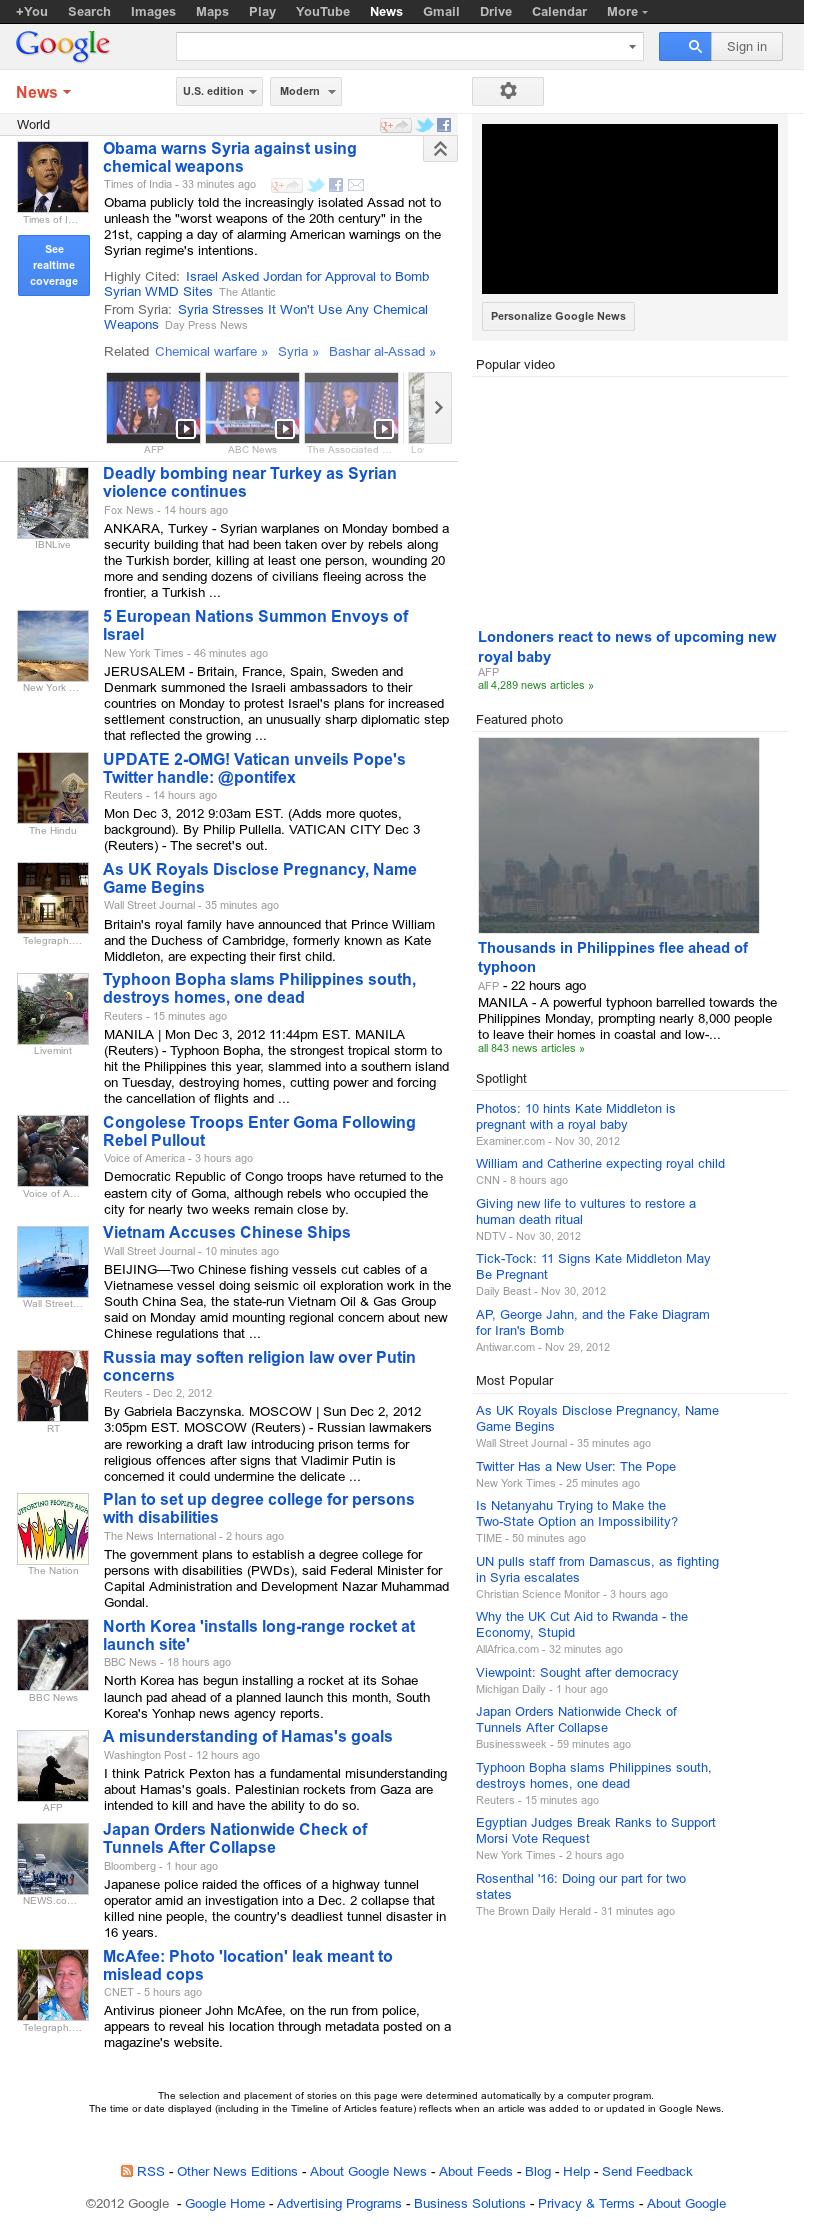 Google News: World at Tuesday Dec. 4, 2012, 5:14 a.m. UTC